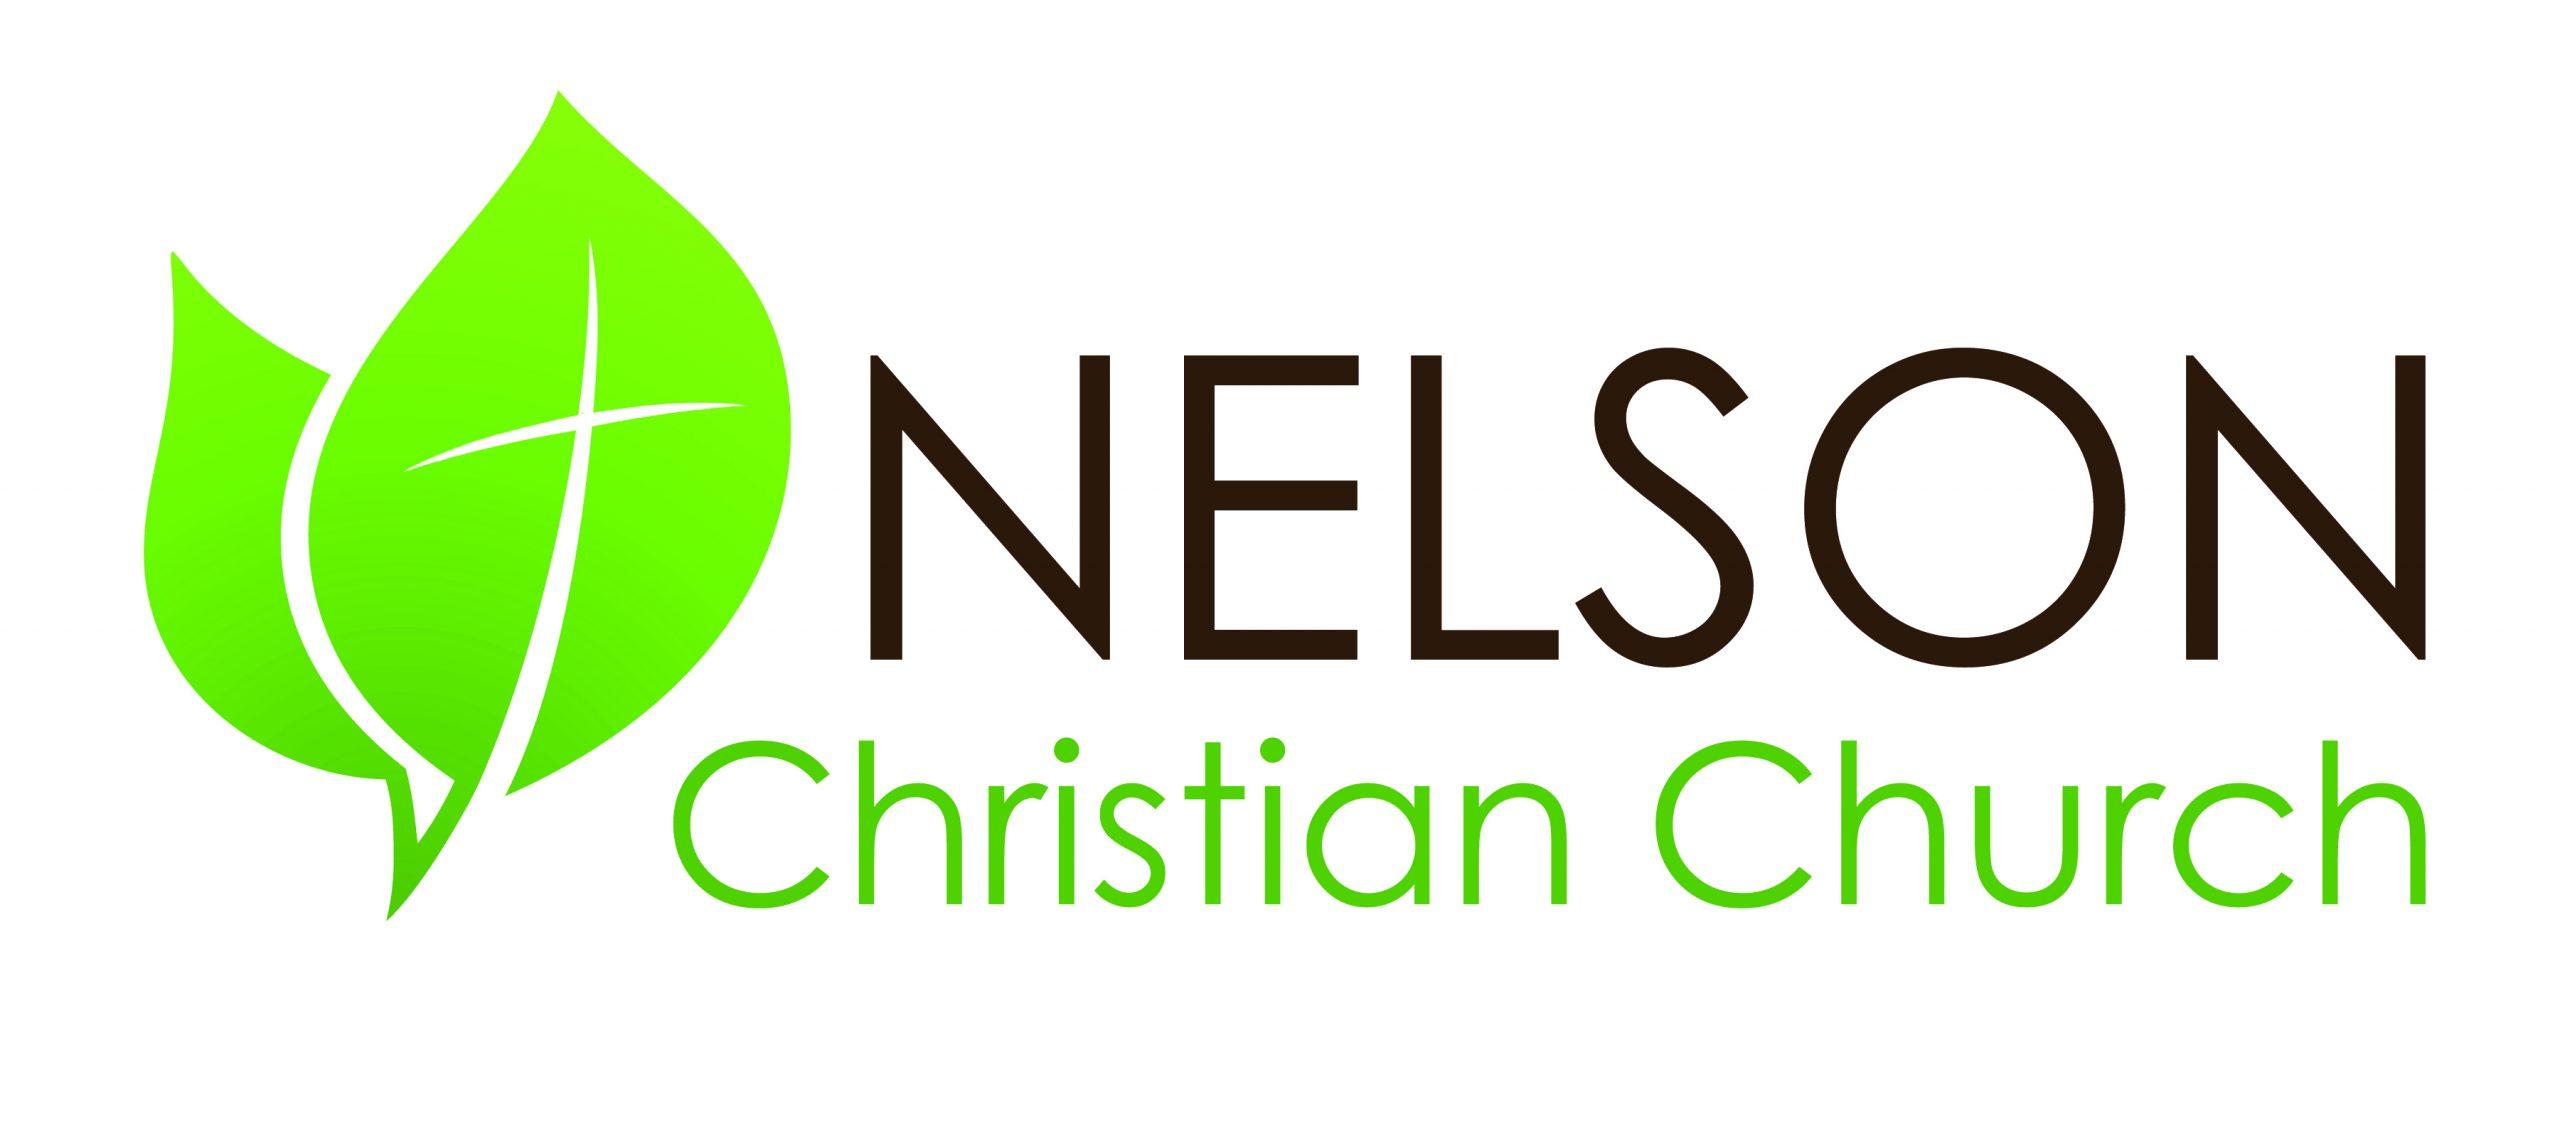 Nelson Christian Church Logo